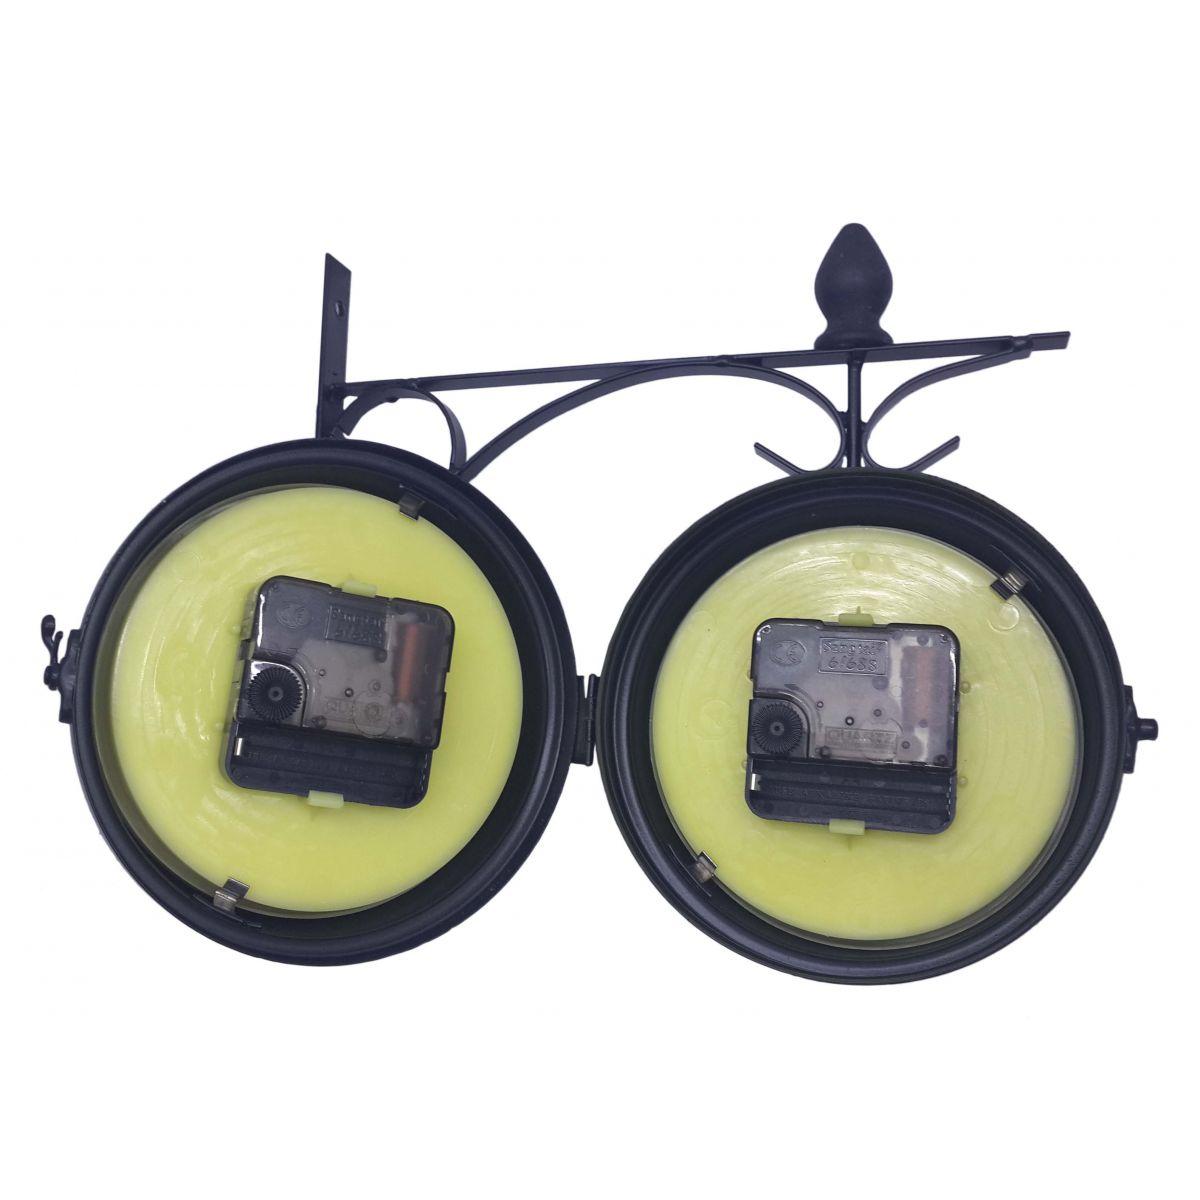 Relogio De Parede Vintage Retro Decorativo Dupla Face Para Casa (REL-25)